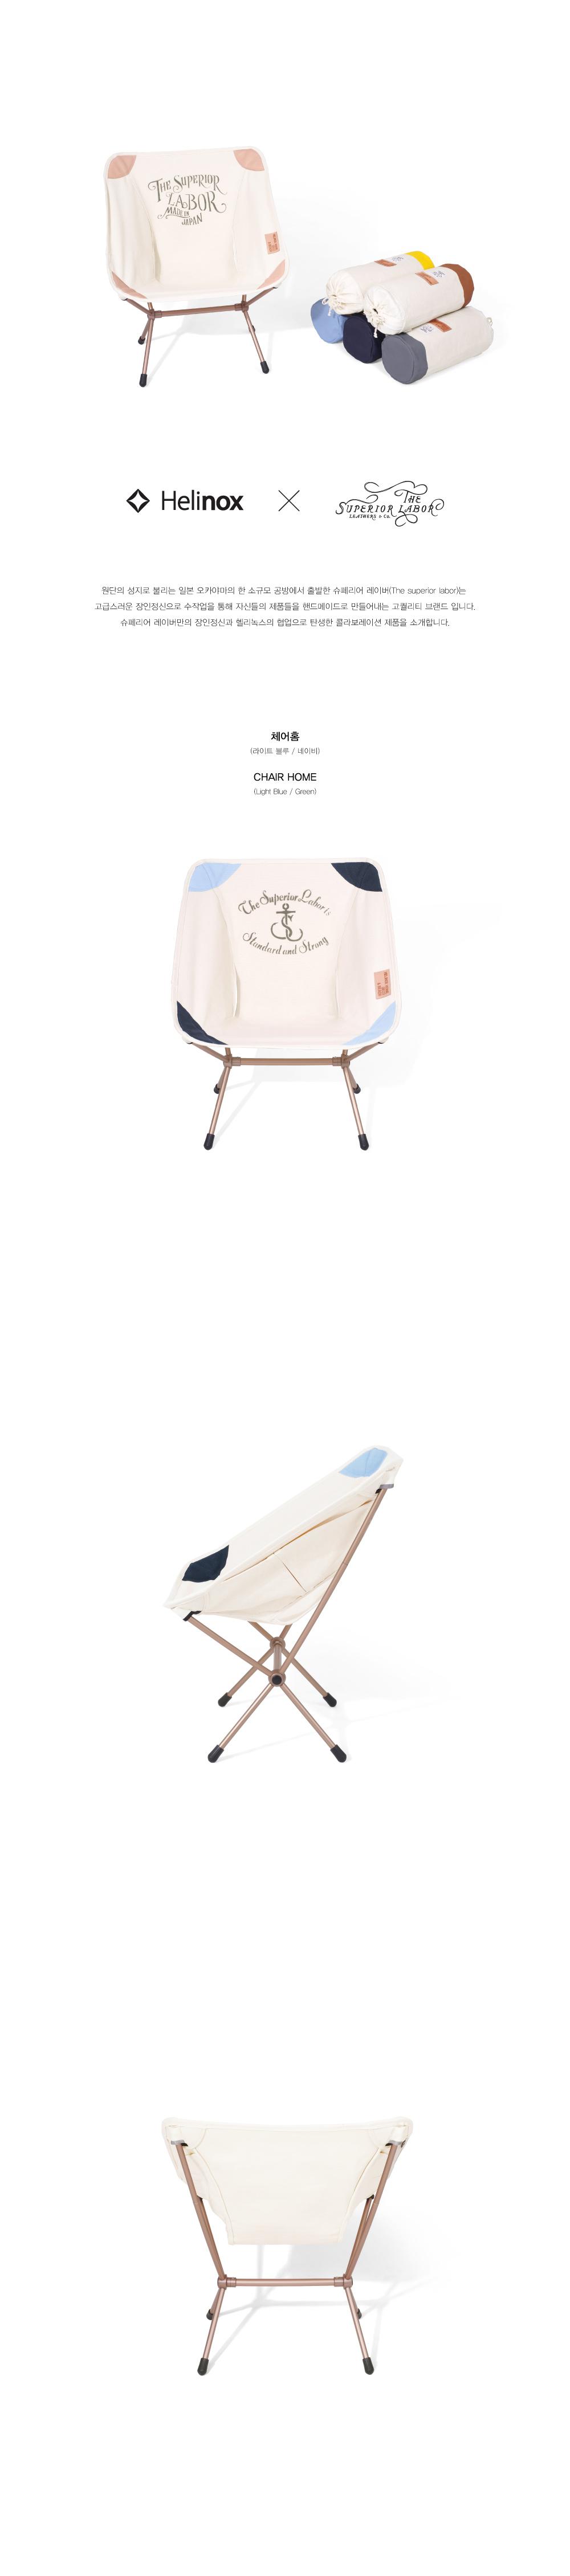 20170720-TSL-Collaboration상세페이지_chair-one_Light-Blue-Navy-1.jpg